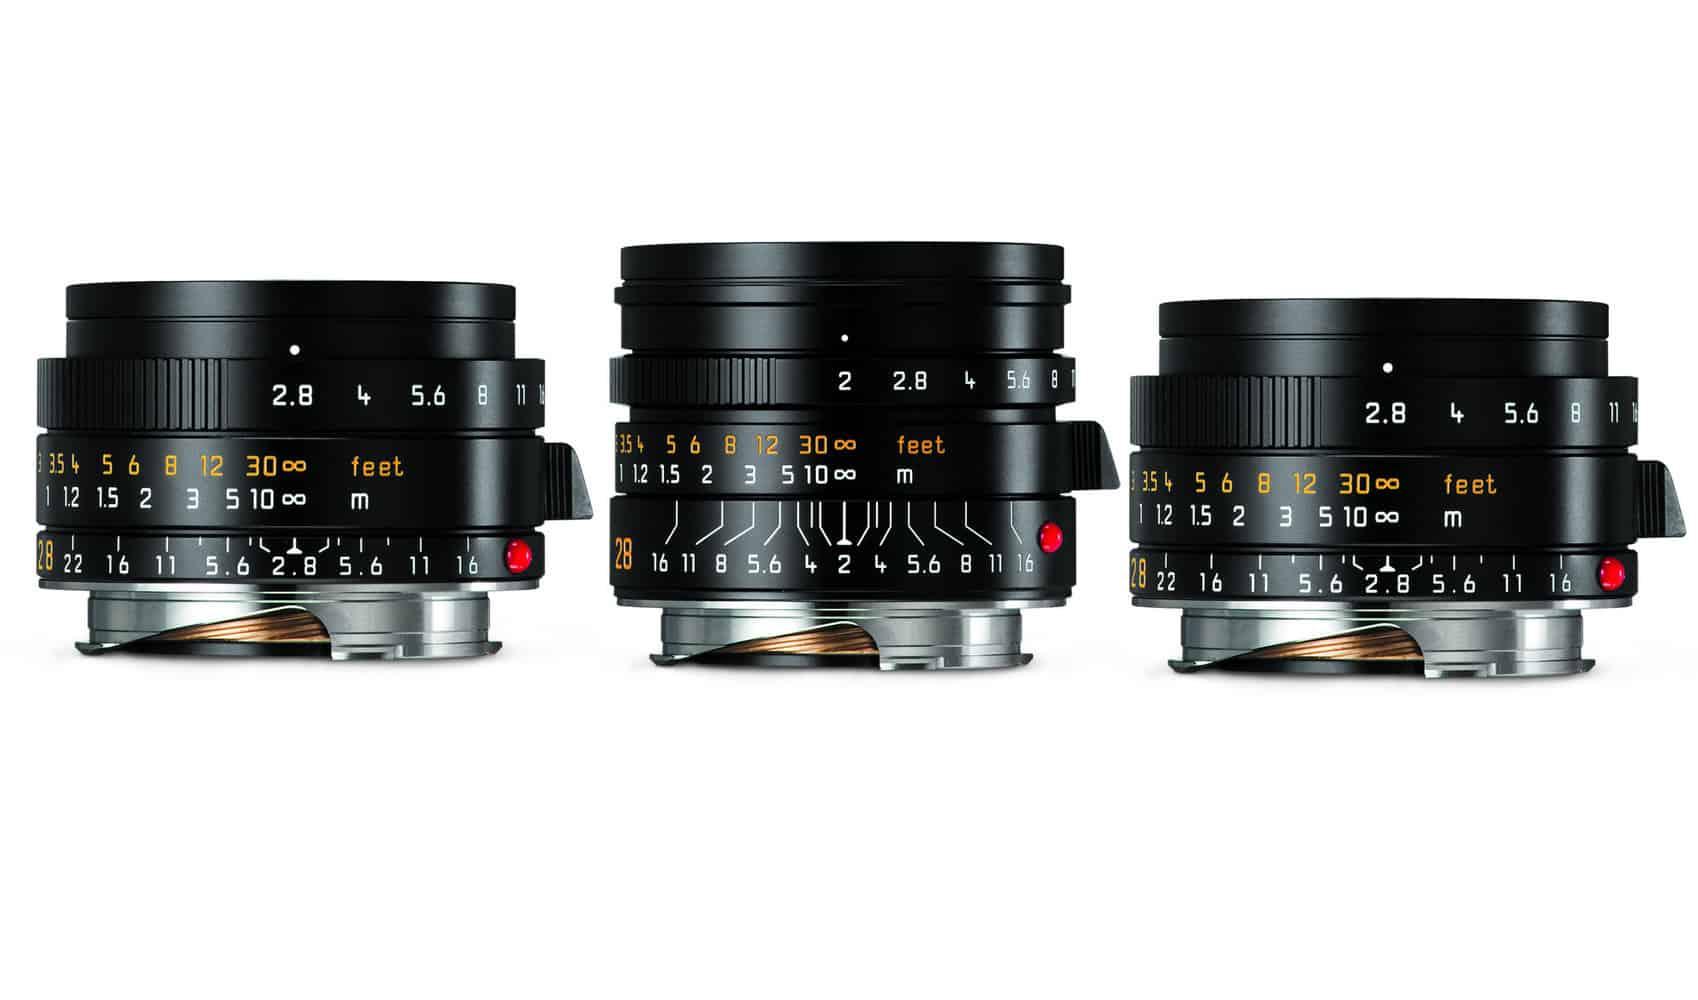 Leica M objectieven